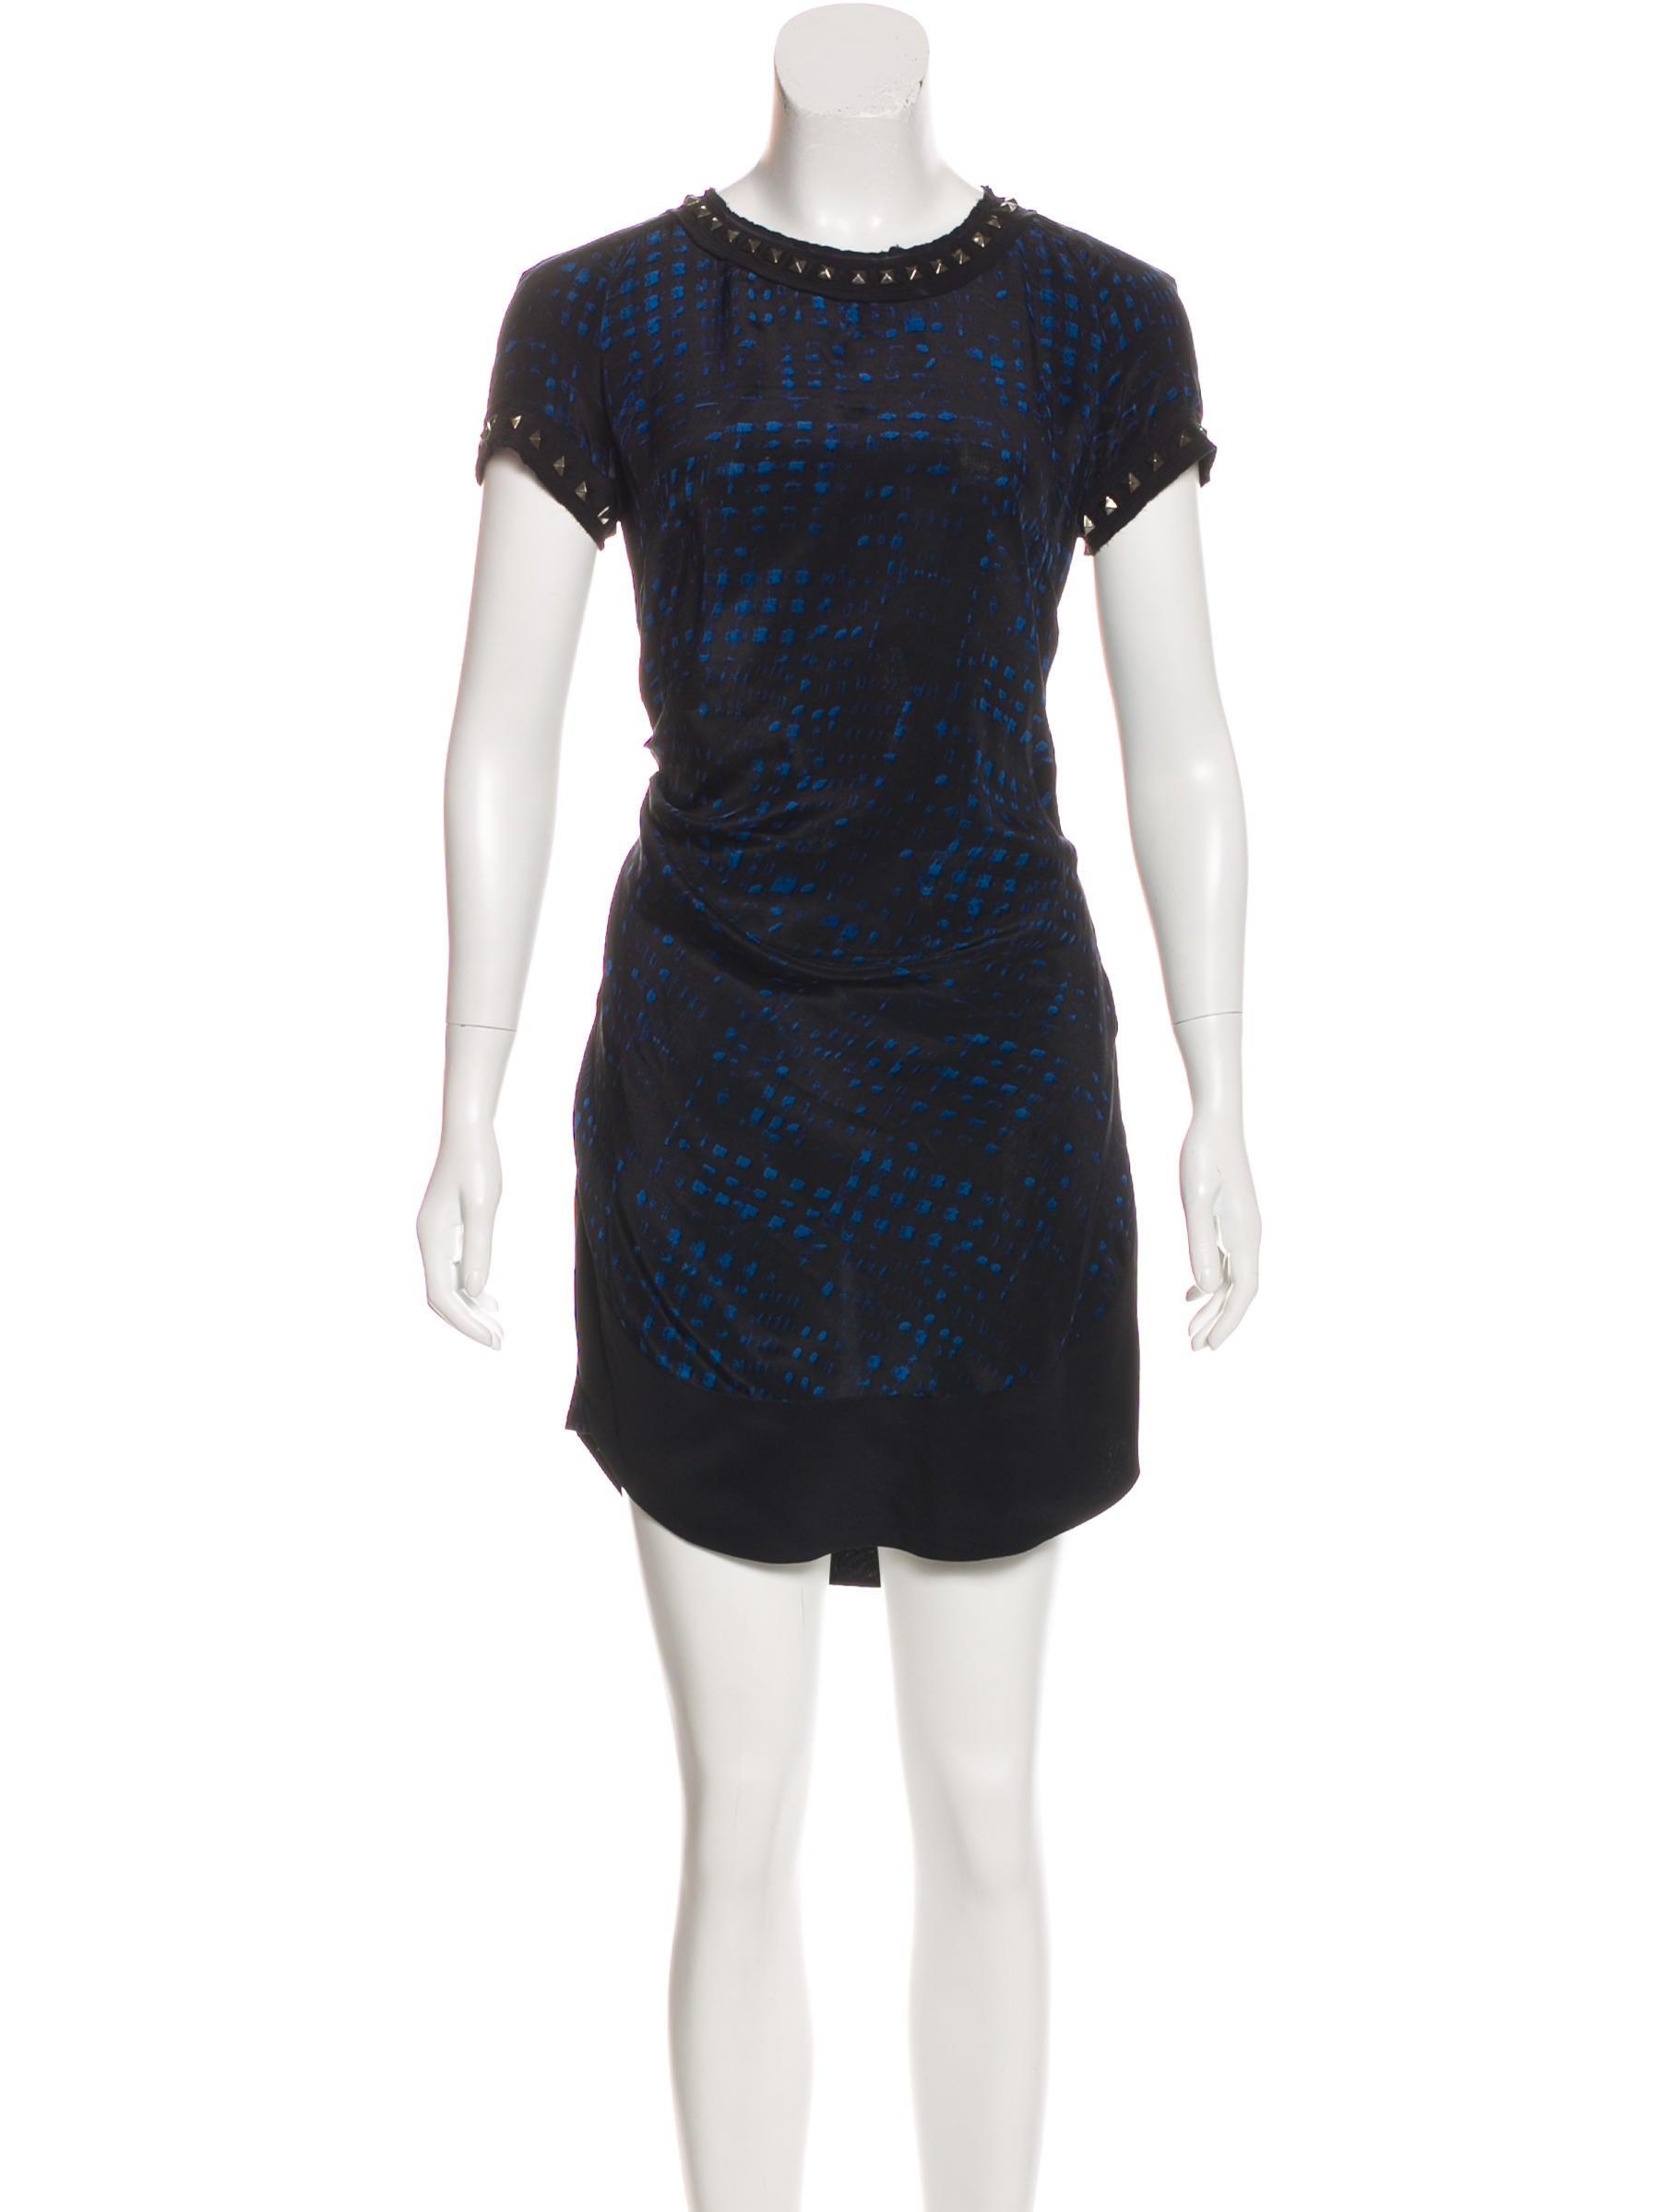 Toile isabel marant silk mini dress clothing wet45177 for Isabel marant shirt dress